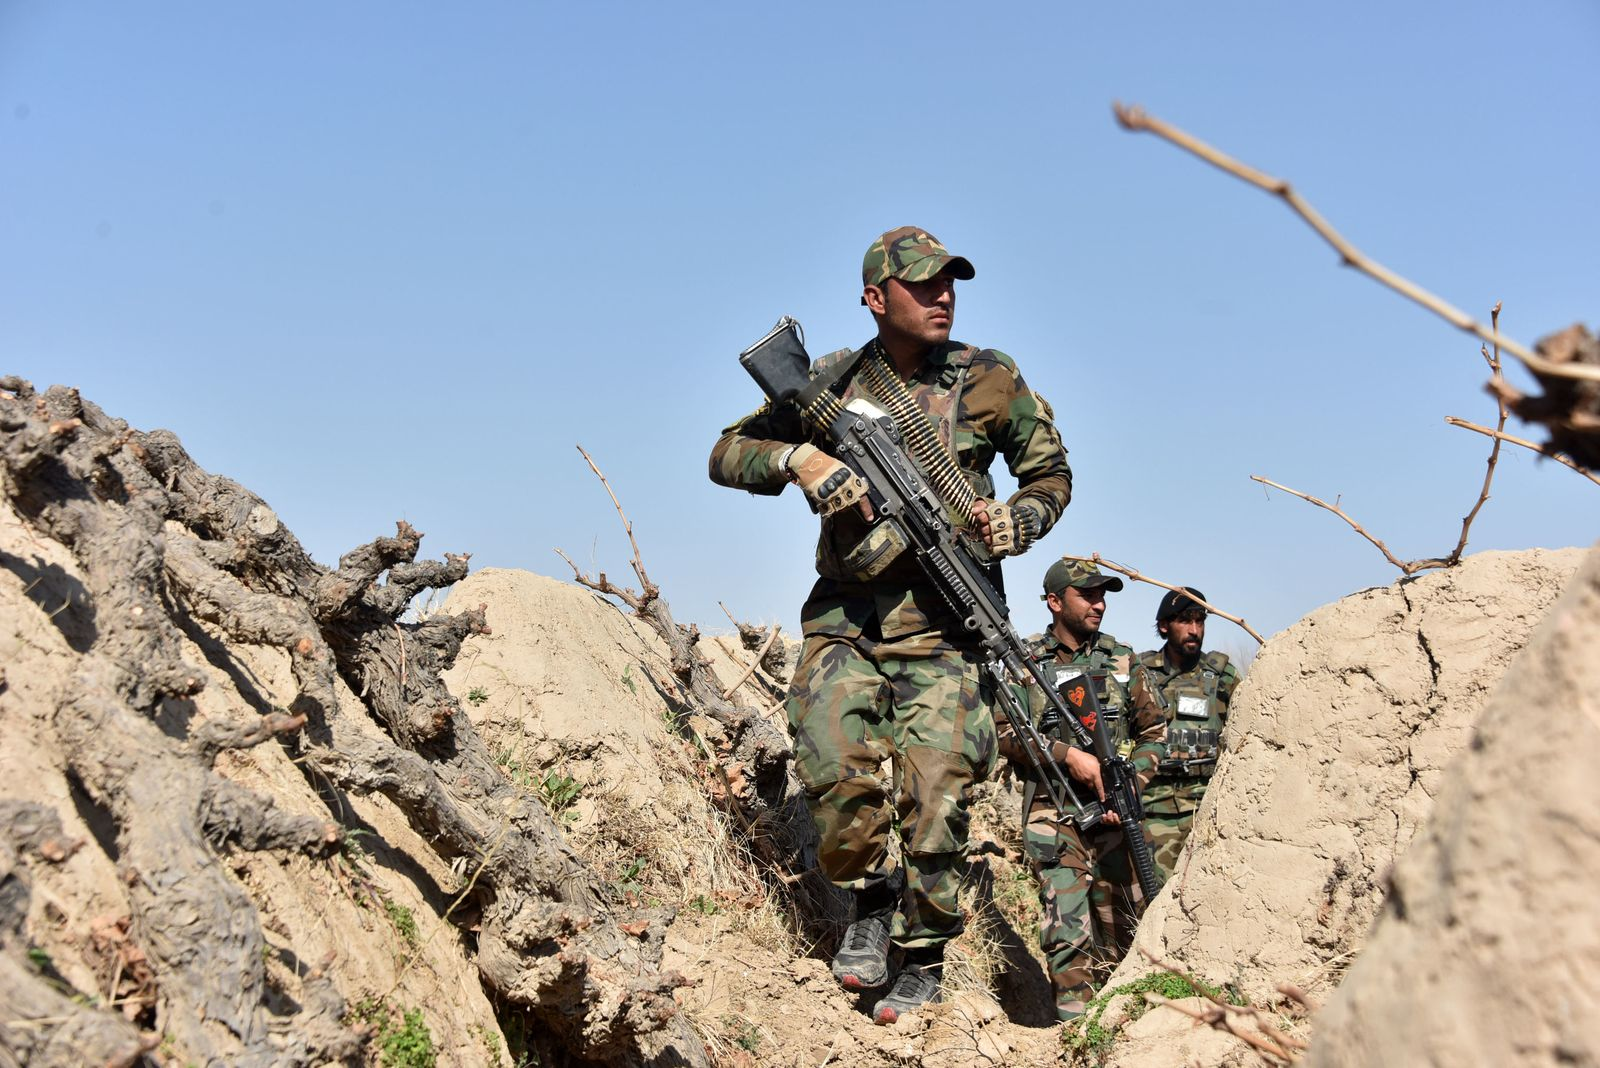 Taliban erobern weitere Gebiete in Afghanistan